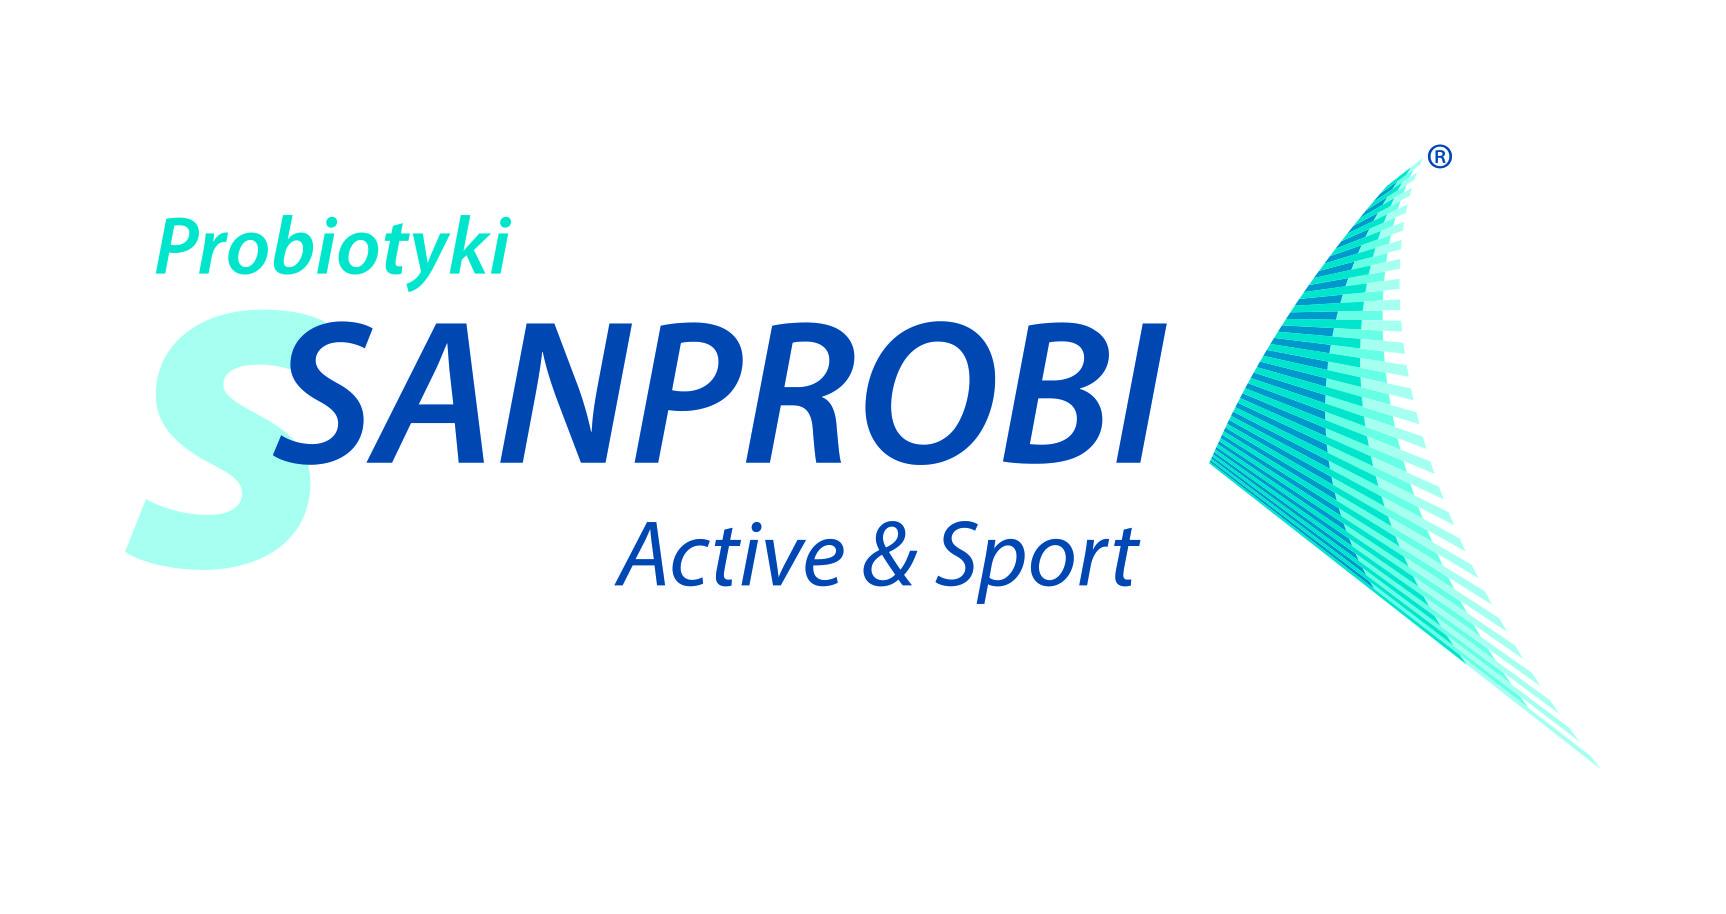 Sanprobi_active_sport